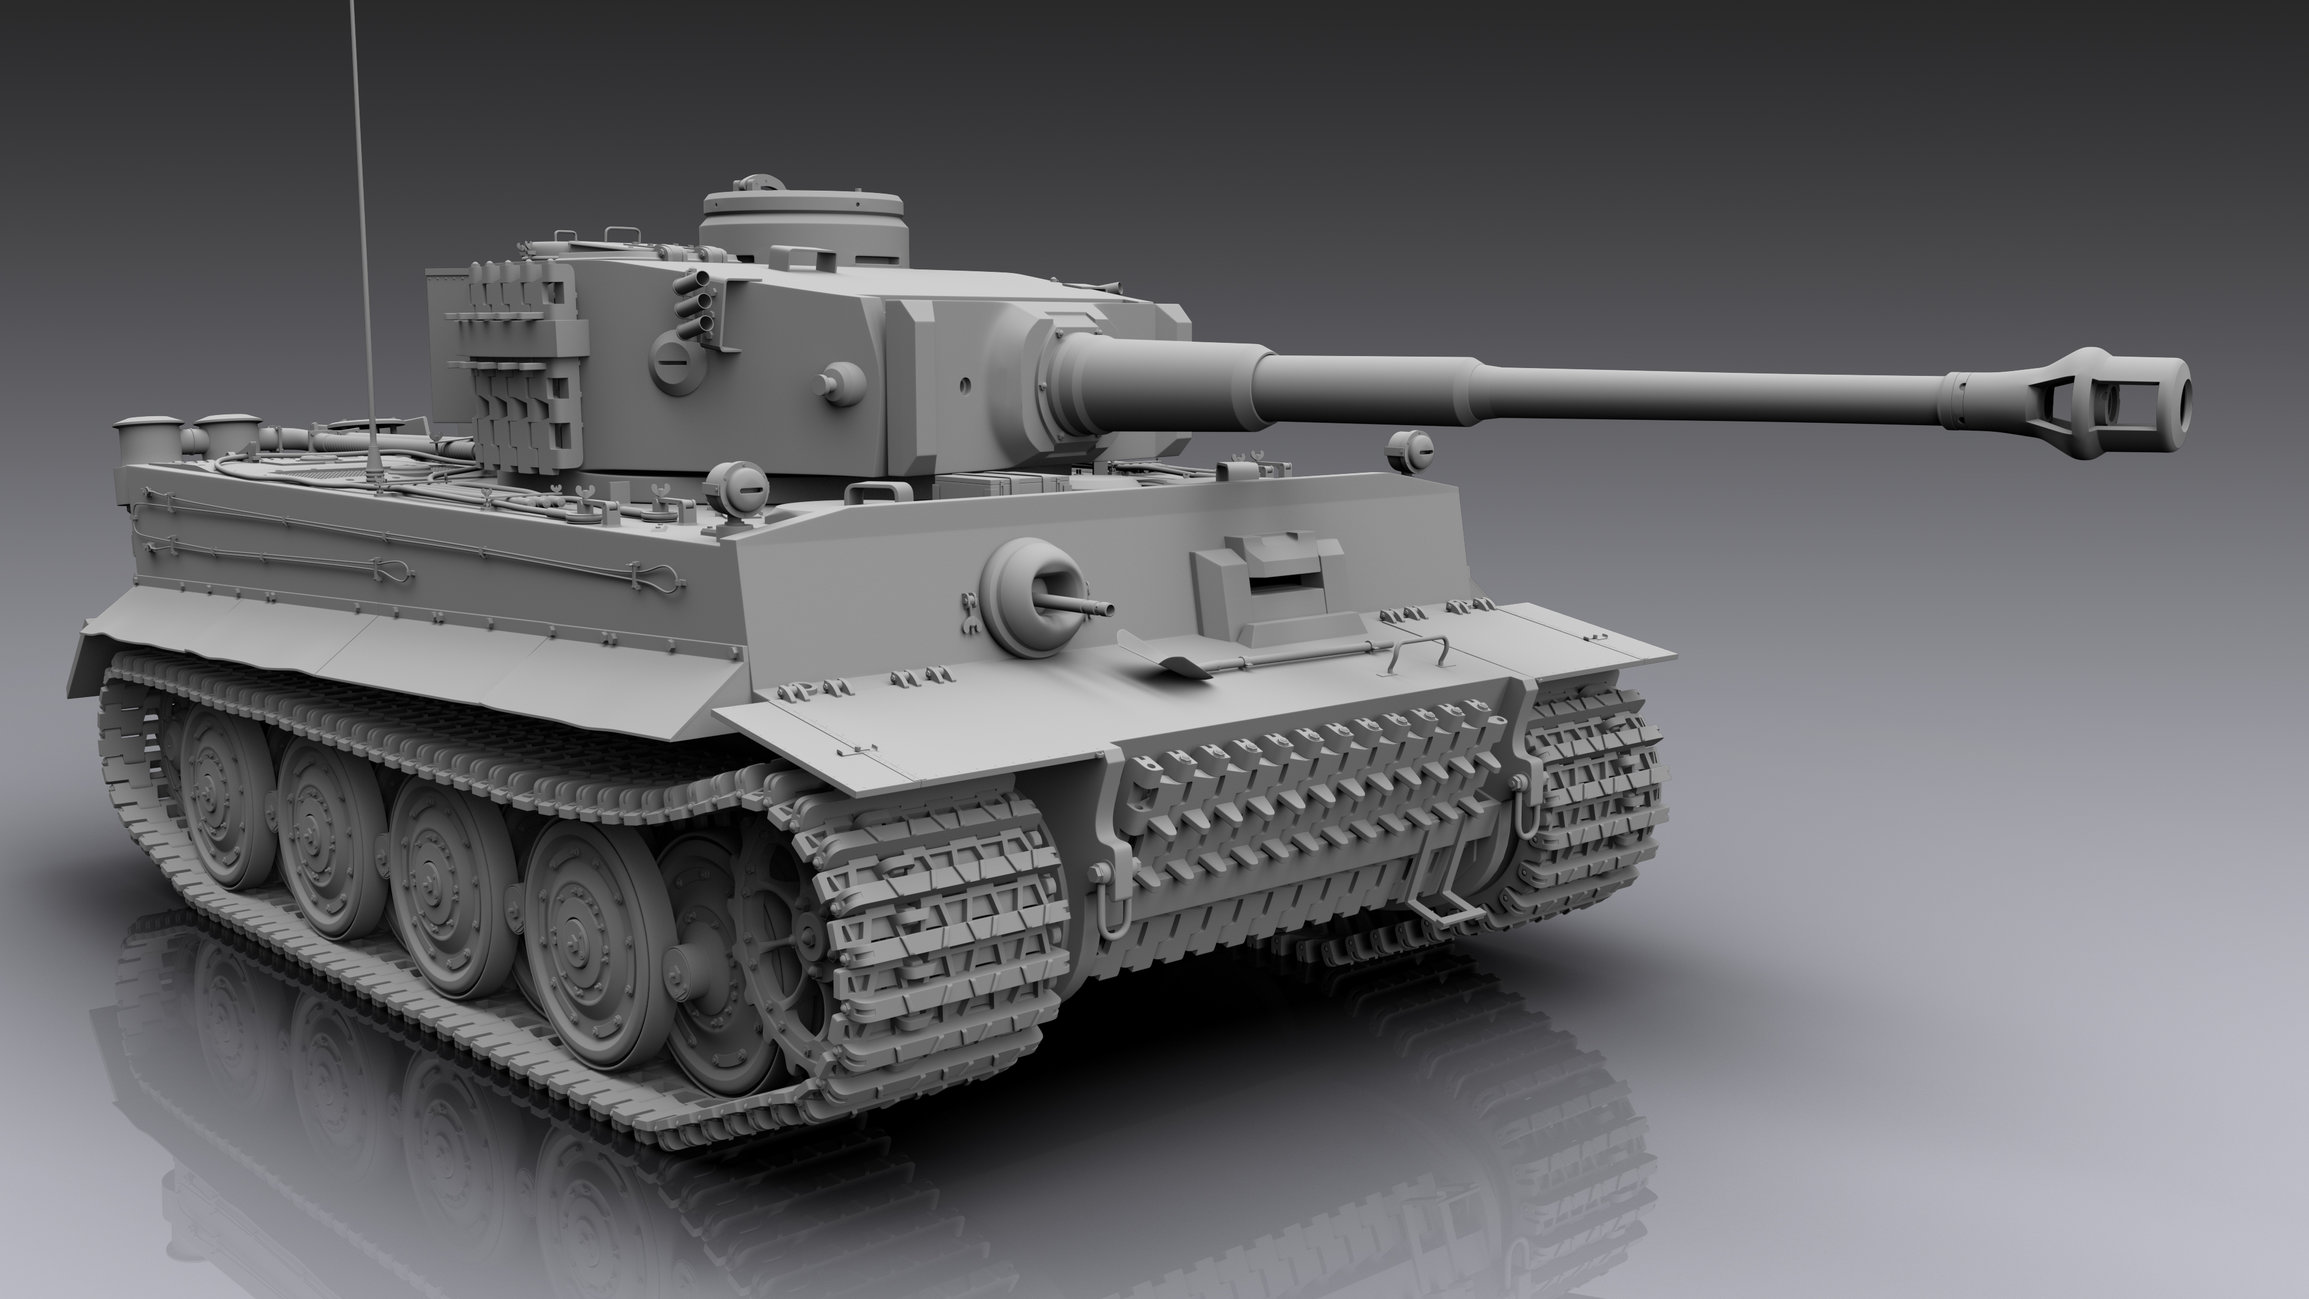 Pz Kpfw Vi Ausf H Tiger I  Sub D Modeling   U2014 Polycount